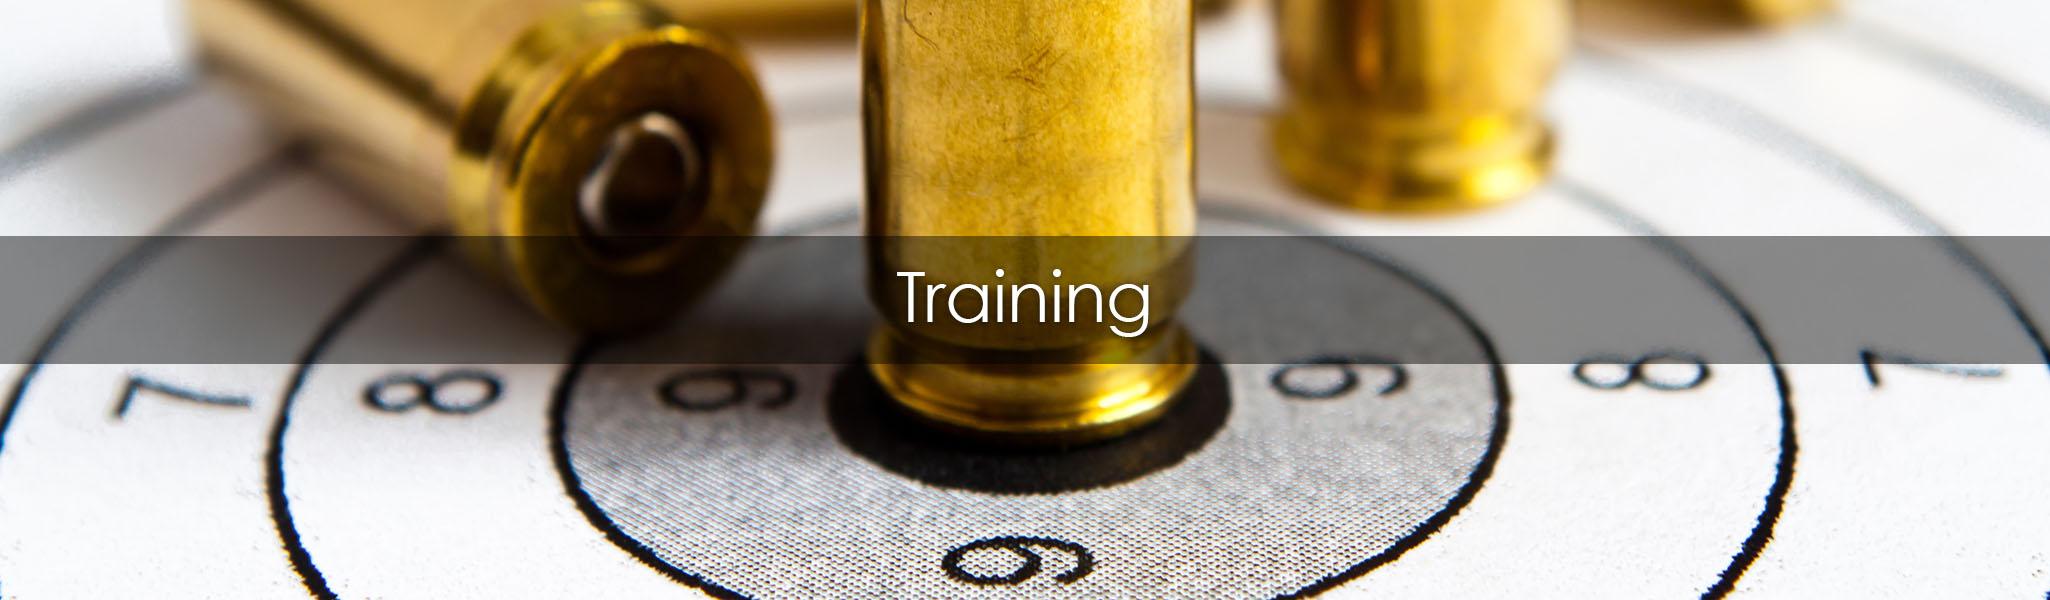 Training - 2050x600 interior sliders